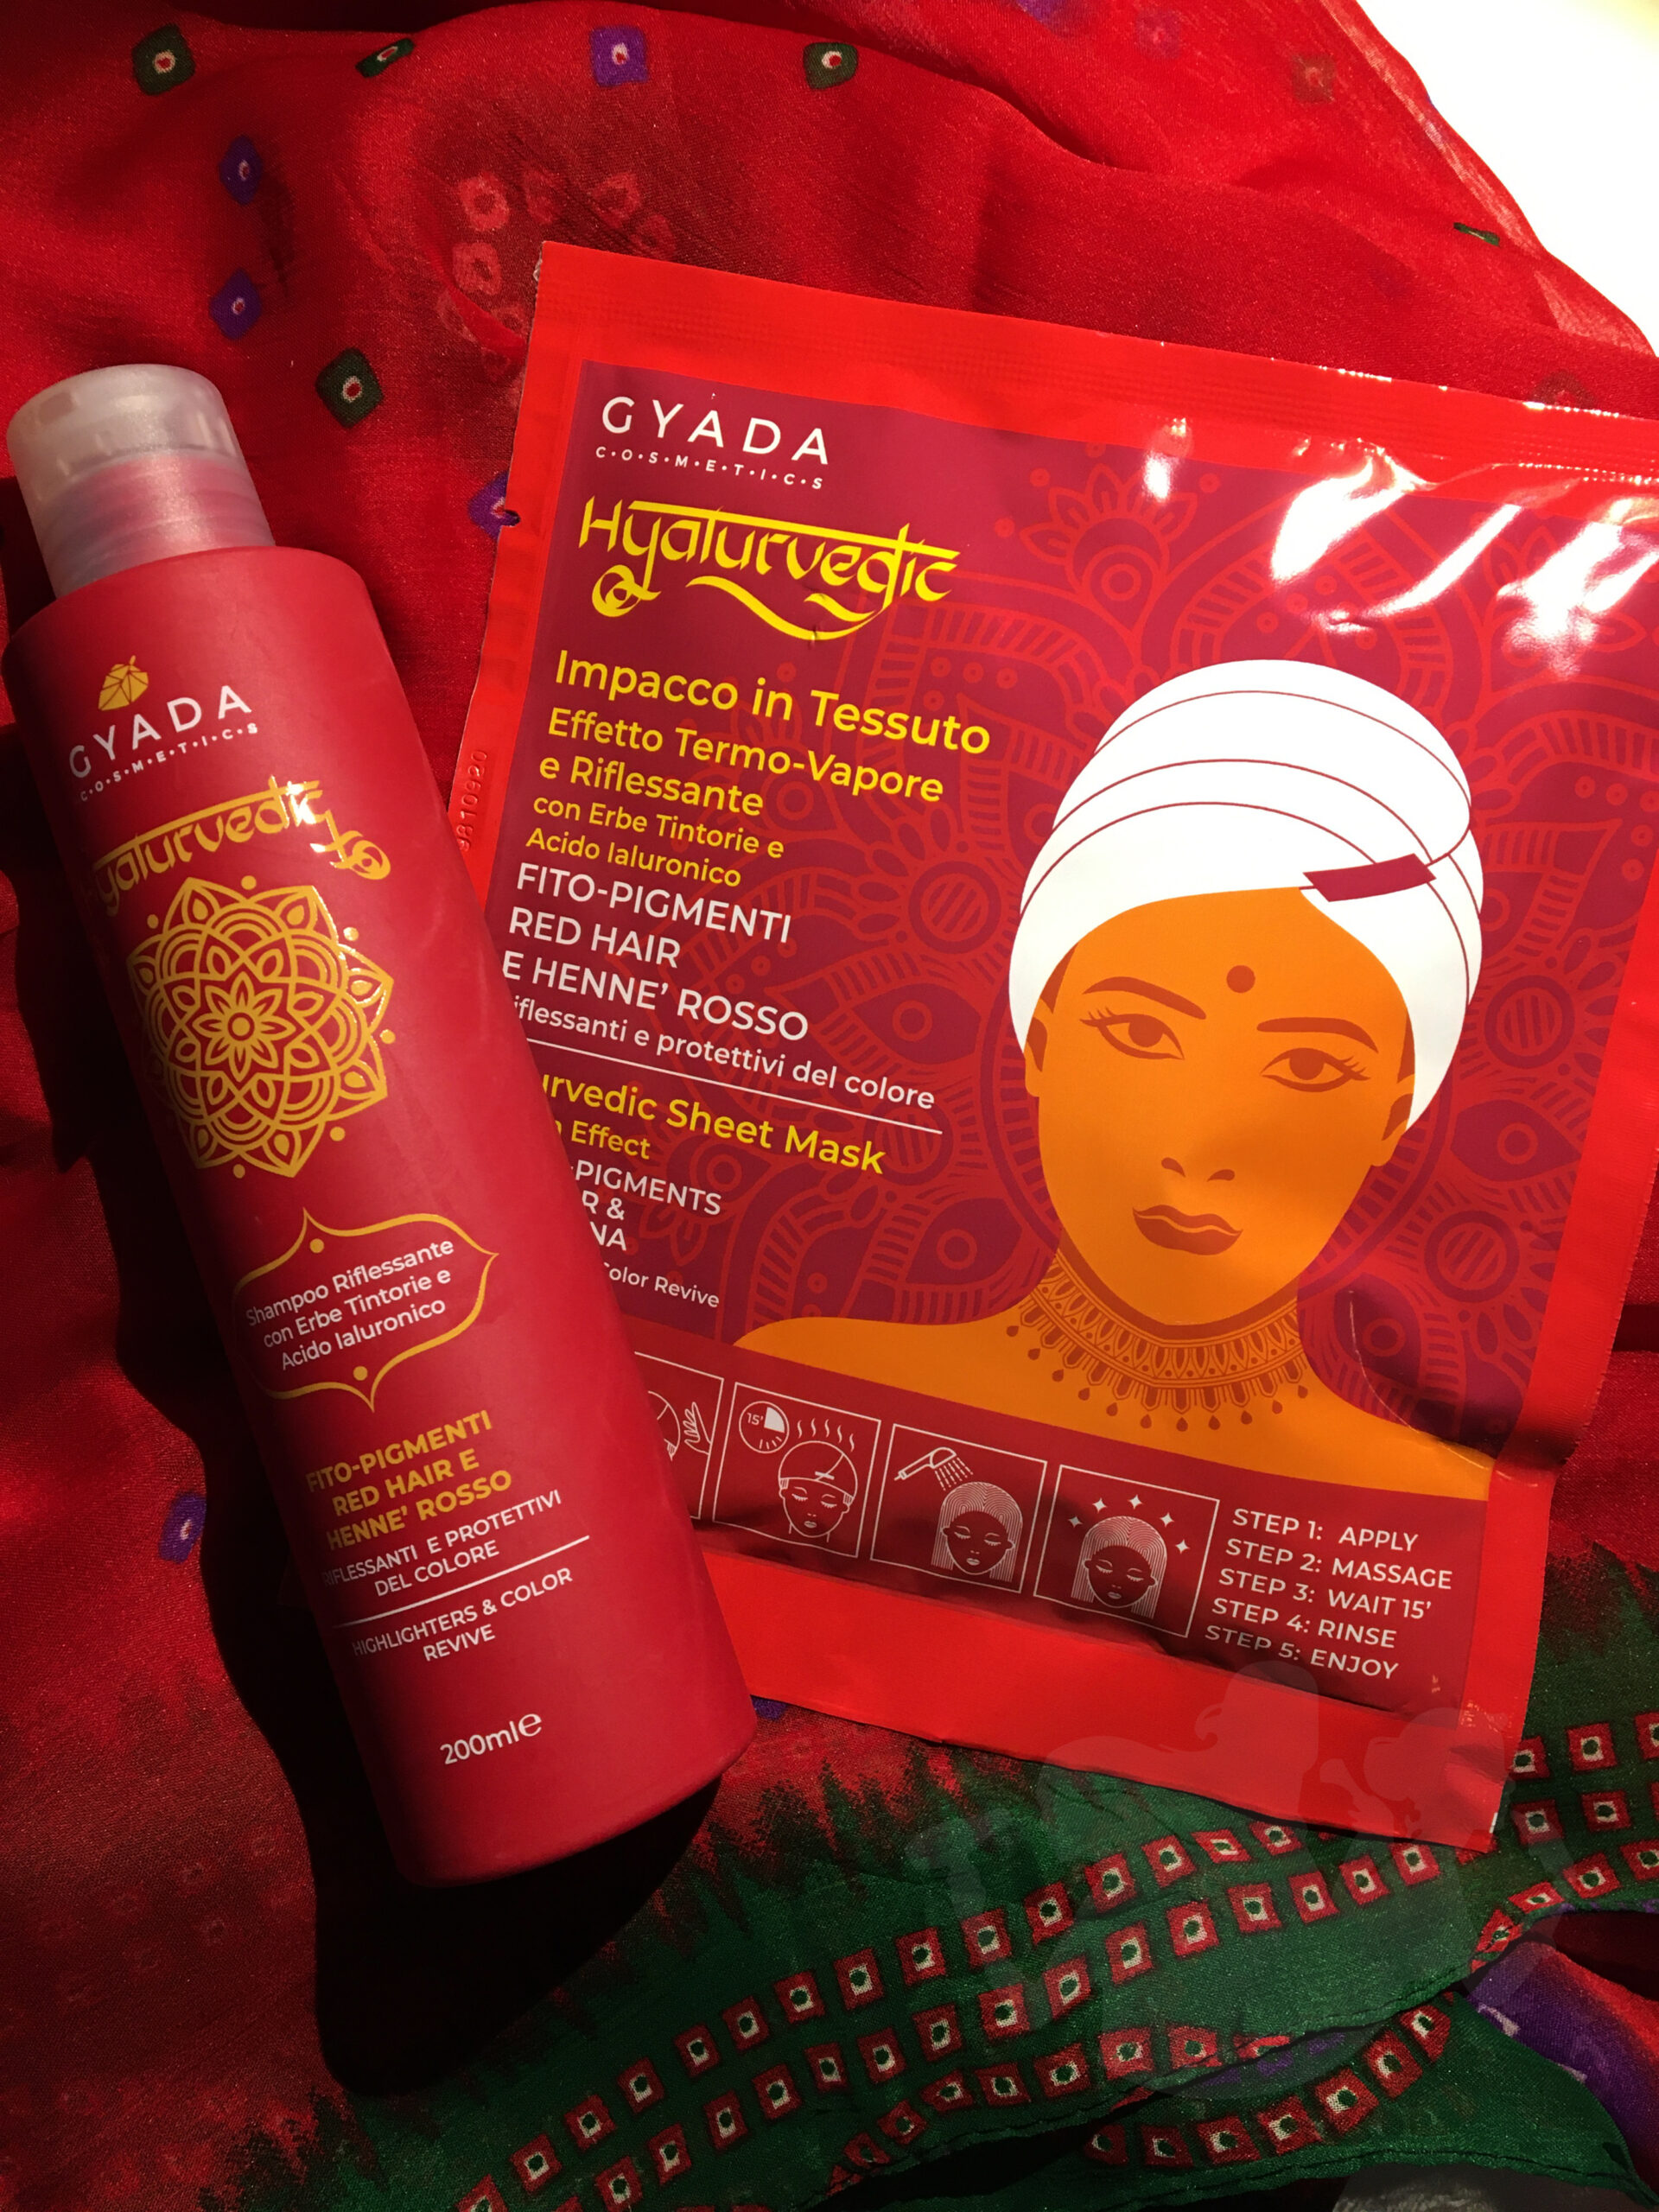 Hyalurvedic Shampoo Riflessante e Maschera Termoattiva Red hair - Gyada Cosmetics